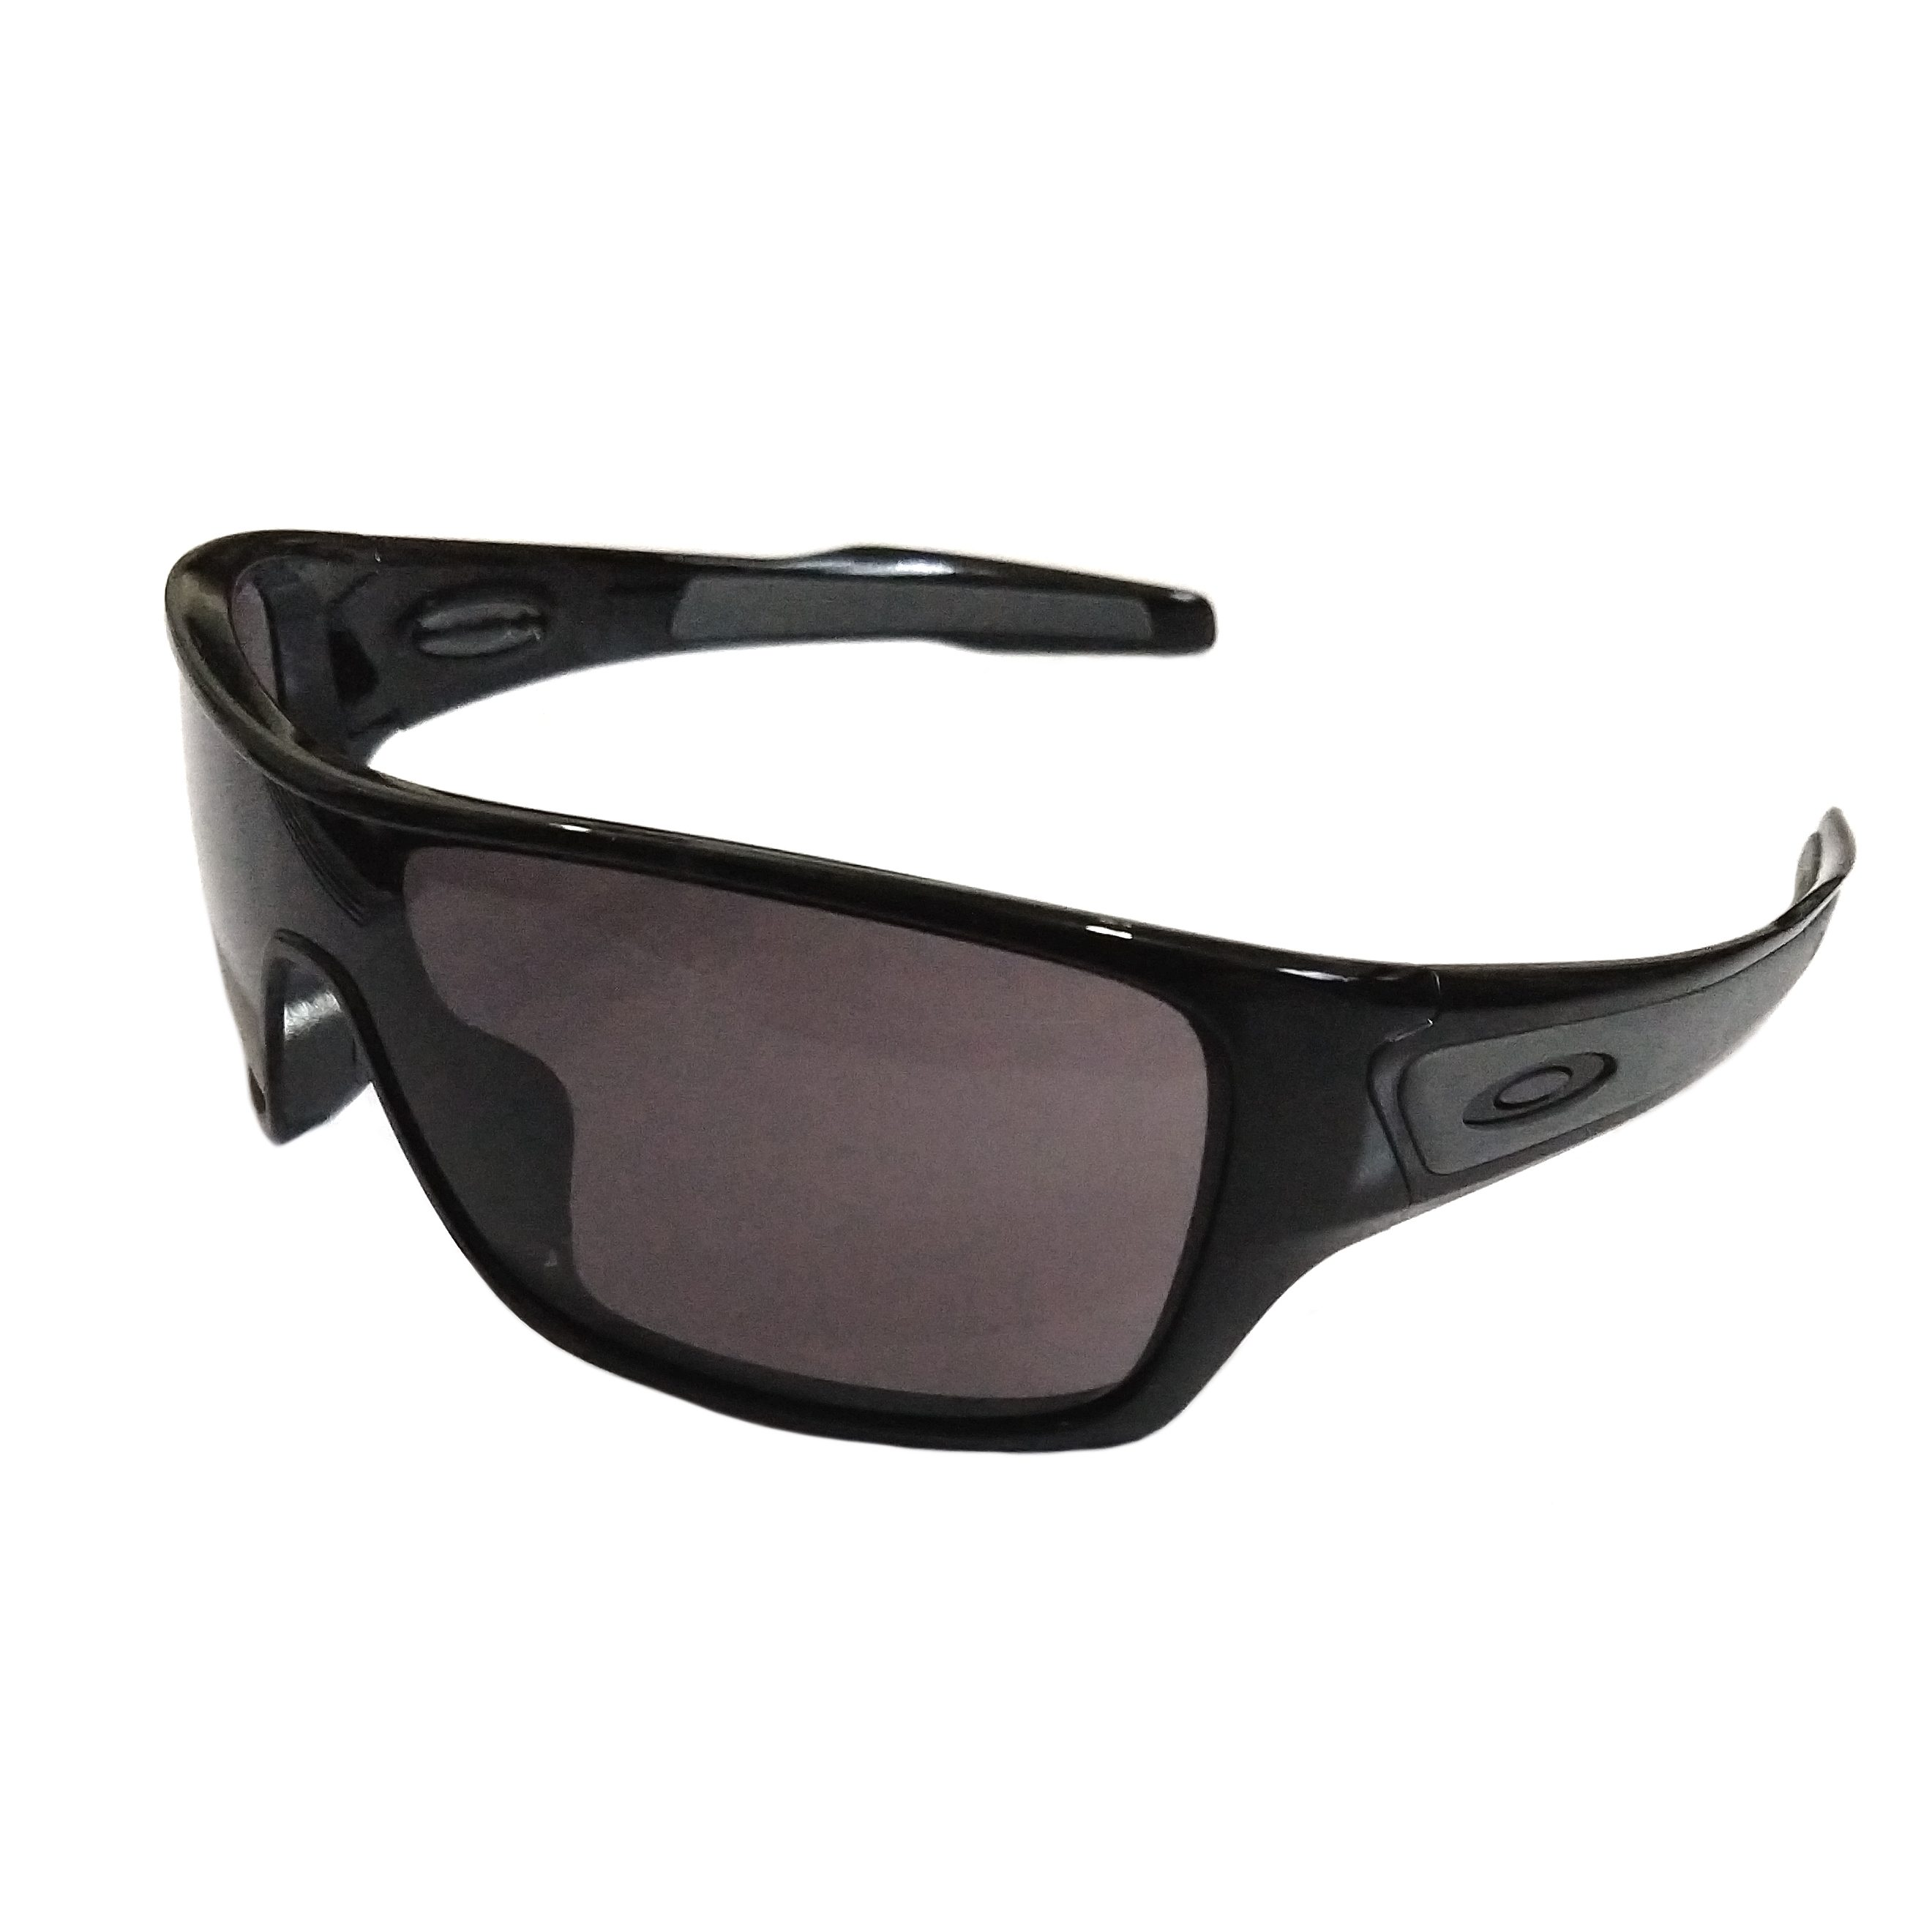 75d94bd4cfe0 Oakley Turbine Rotor Sunglasses - Polished Black - Warm Grey OO9307-01